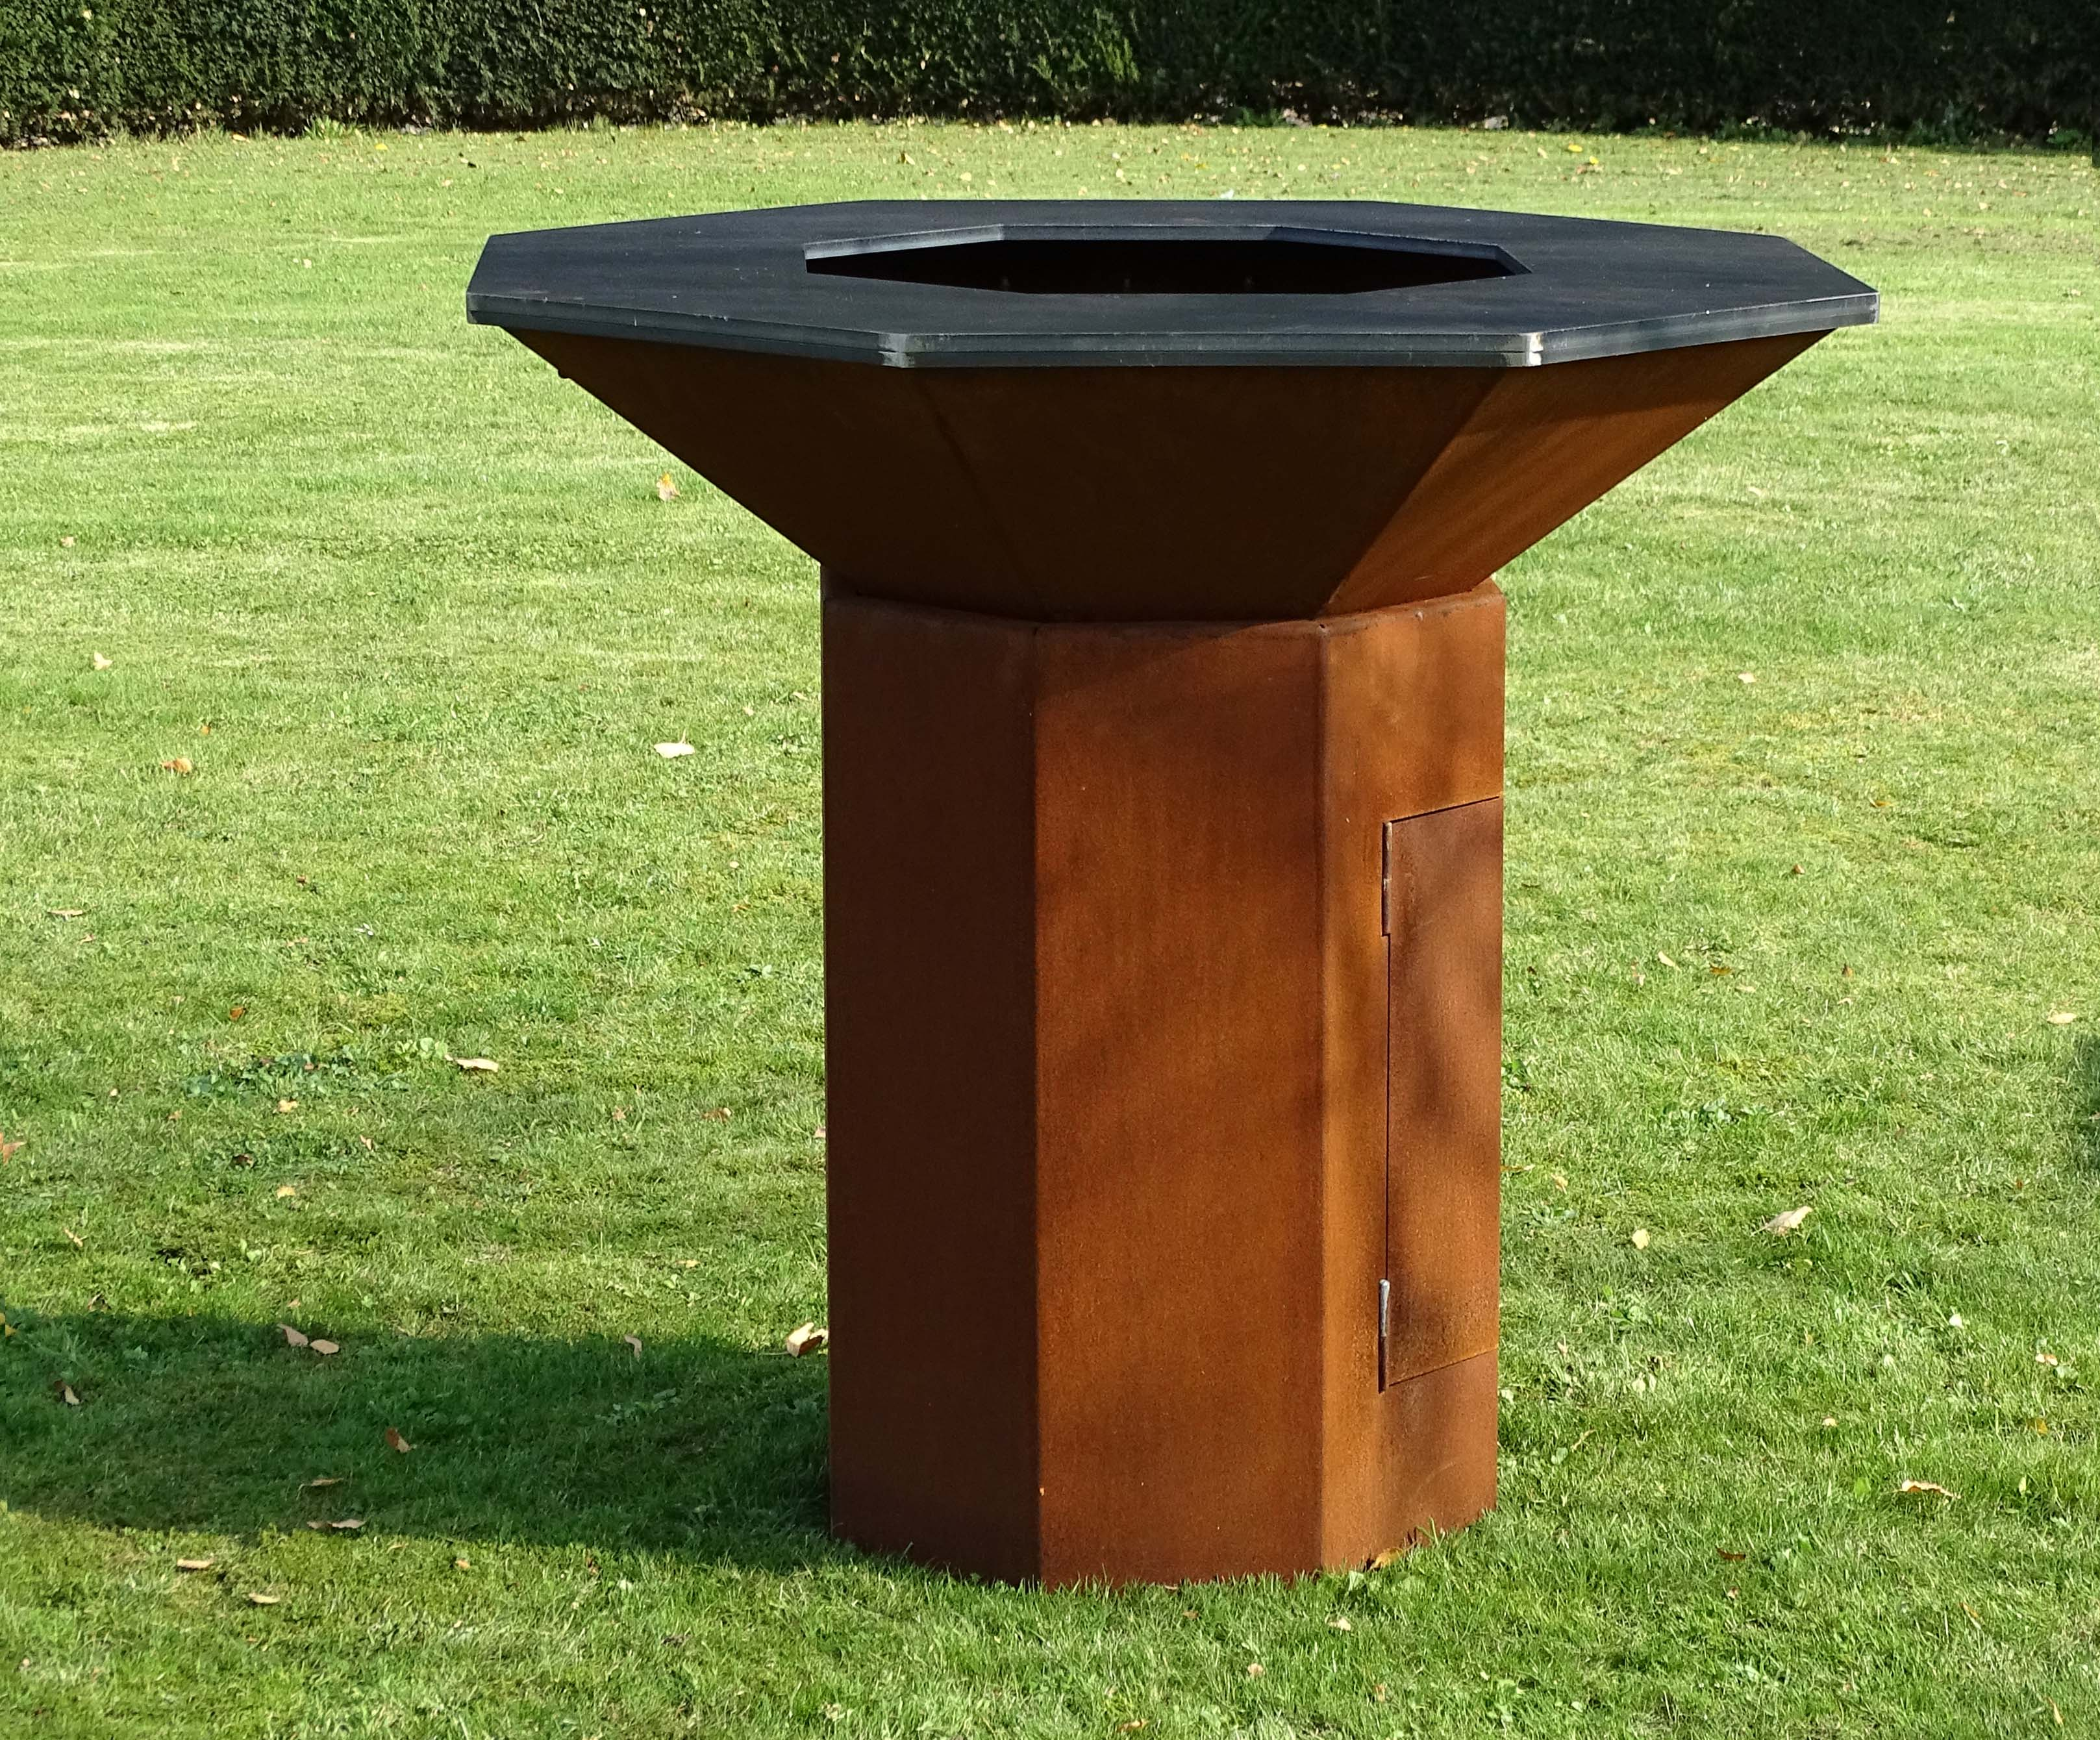 webshop barbecues corten steel bio blaze fireplaces. Black Bedroom Furniture Sets. Home Design Ideas